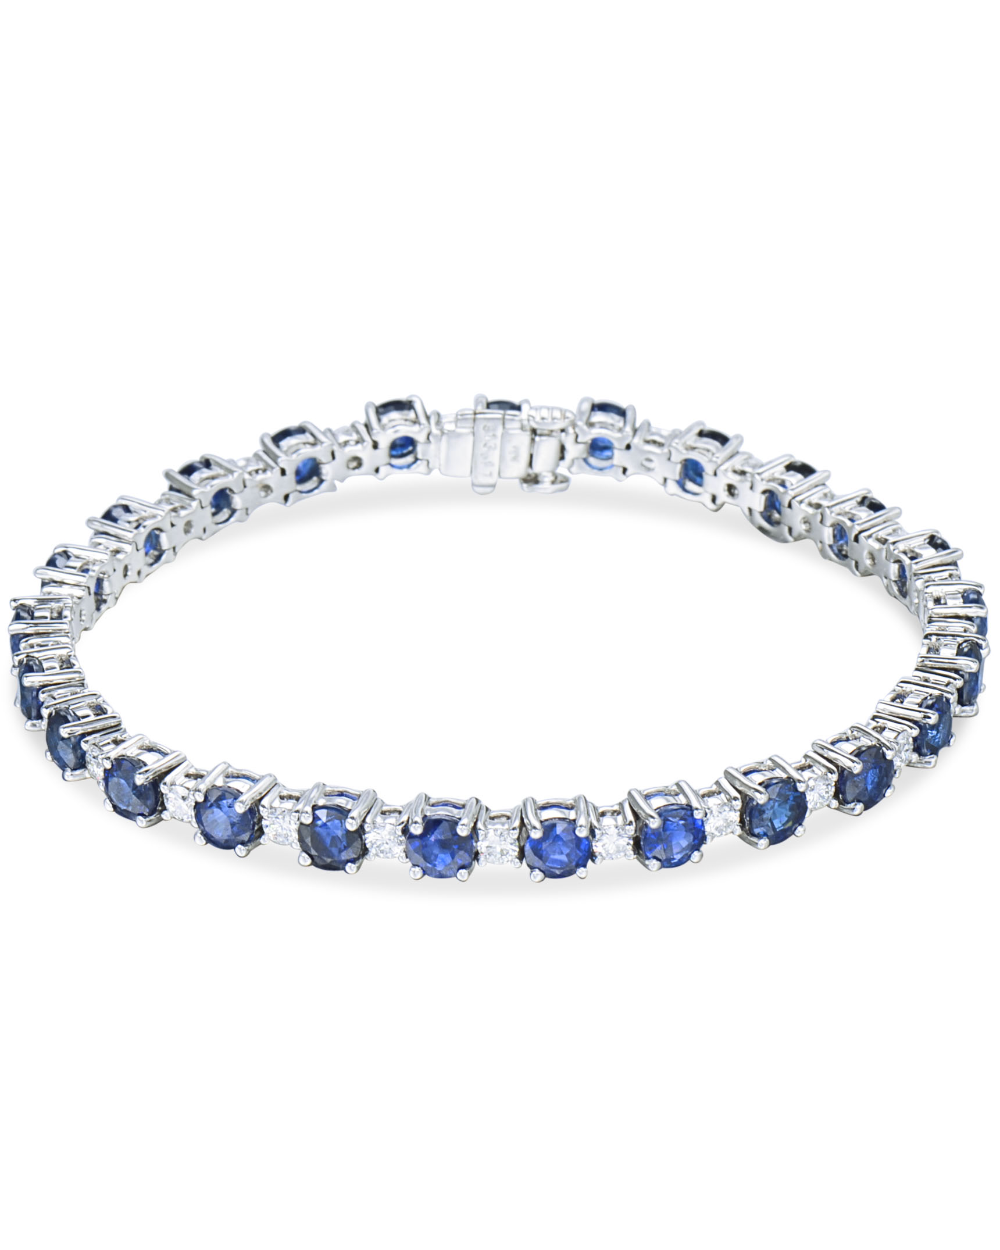 Round Sapphire And Diamond Bracelet Gold Bracelet Set White Gold Bracelet Diamond Bracelets